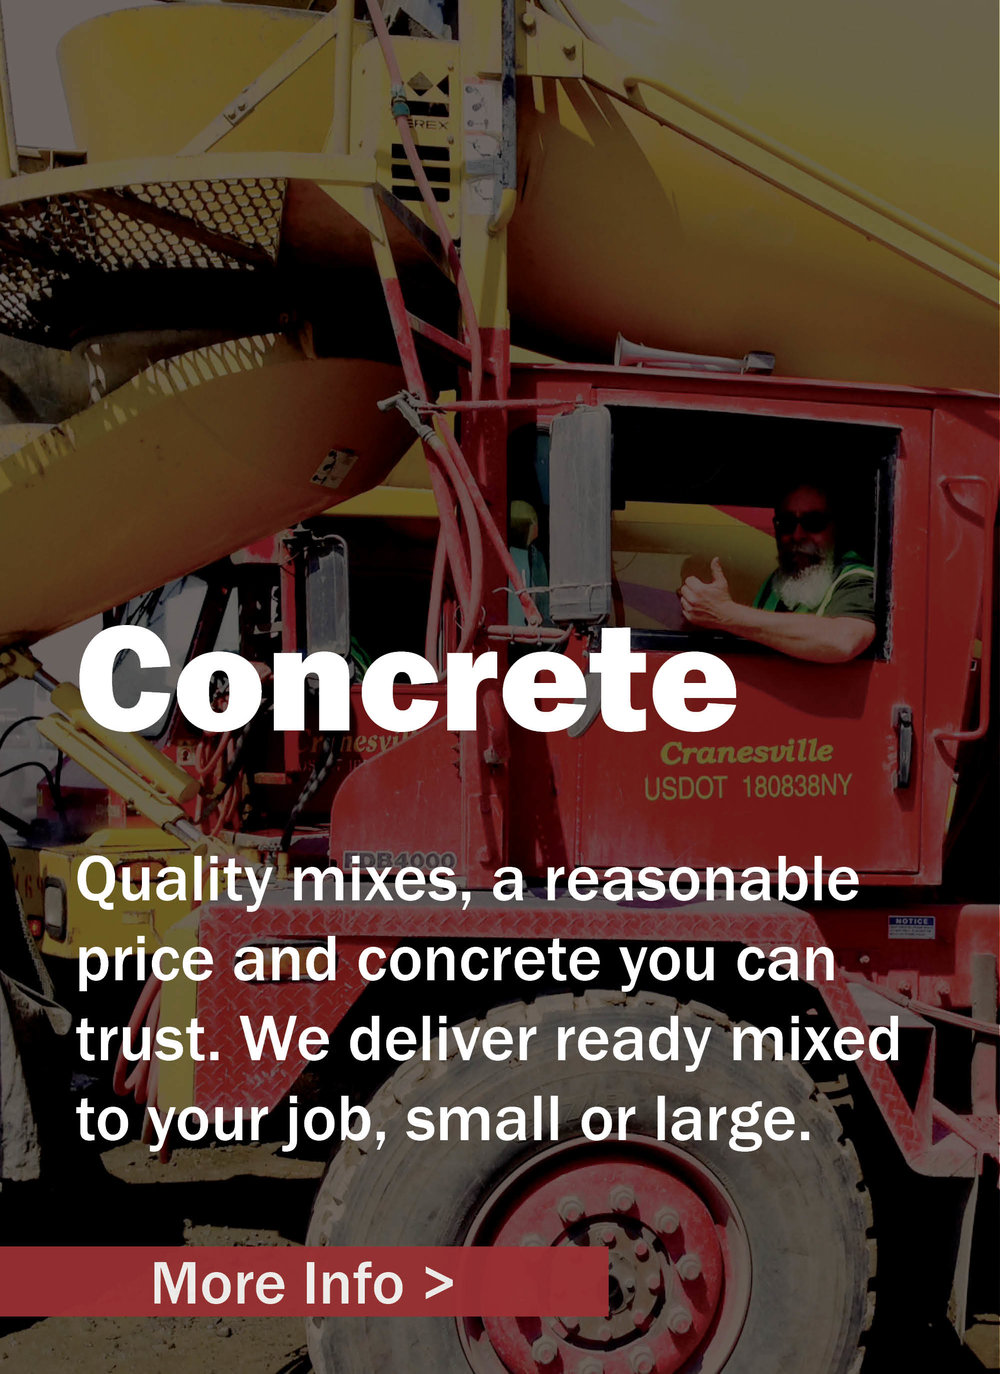 Concrete_Cranesville_Block.jpg